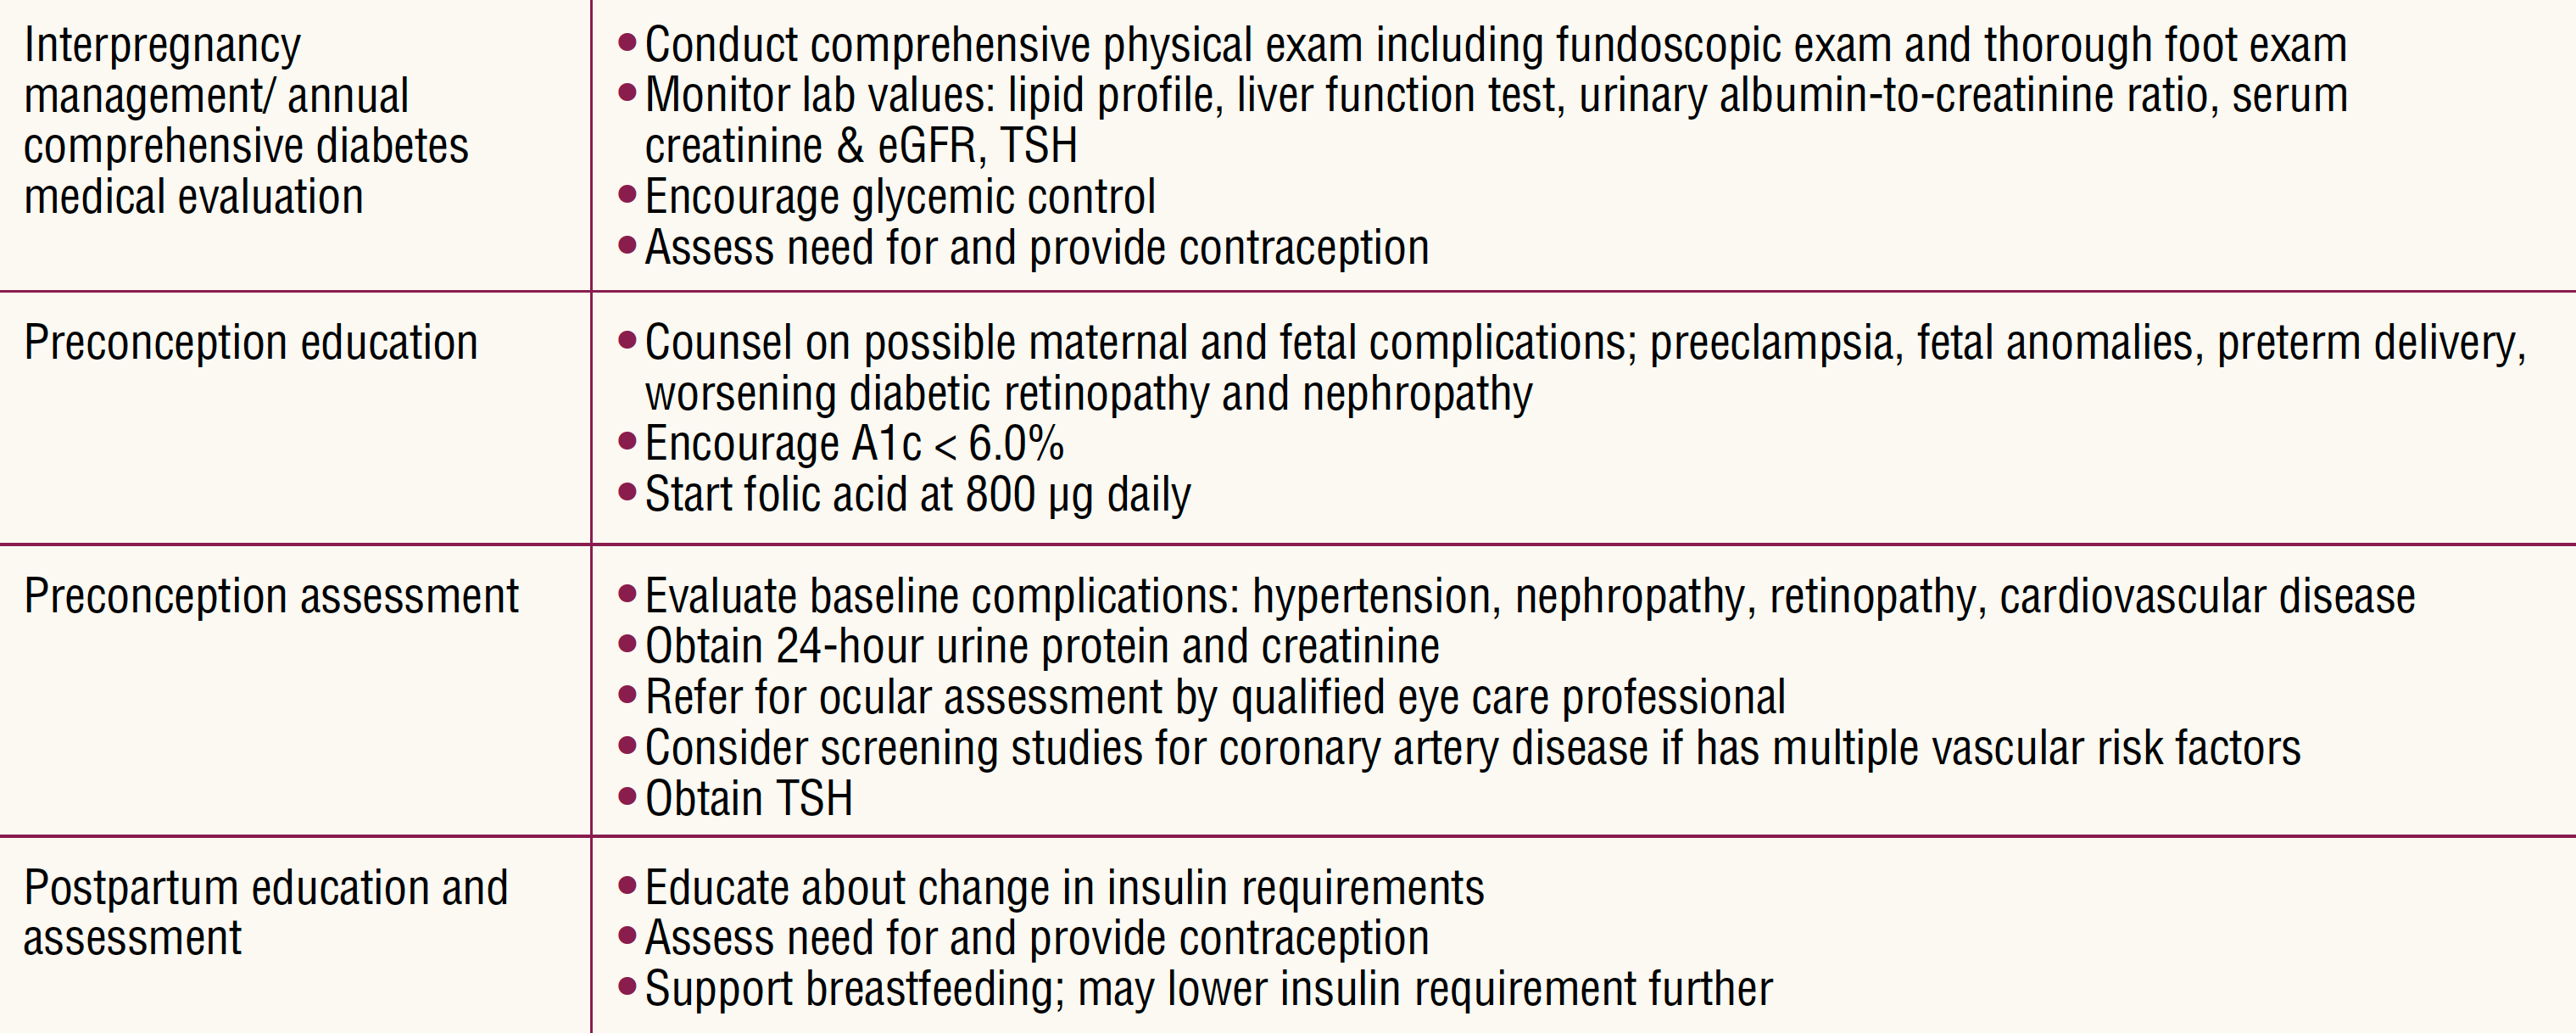 diabetic-gastropharesis-pregnancy-table3